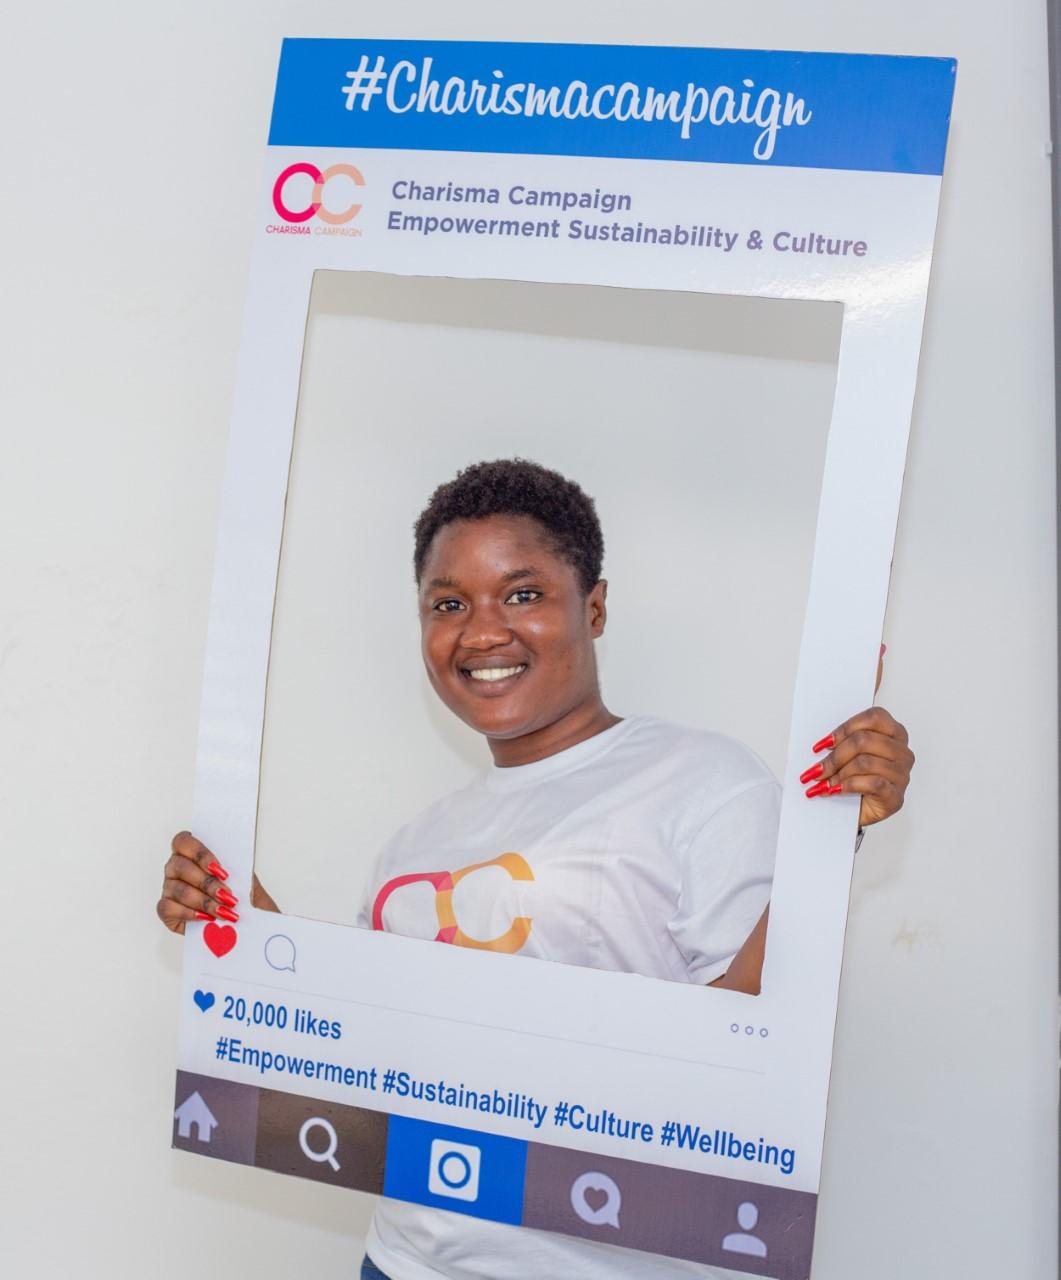 CC Made in Ghana Wellness Program